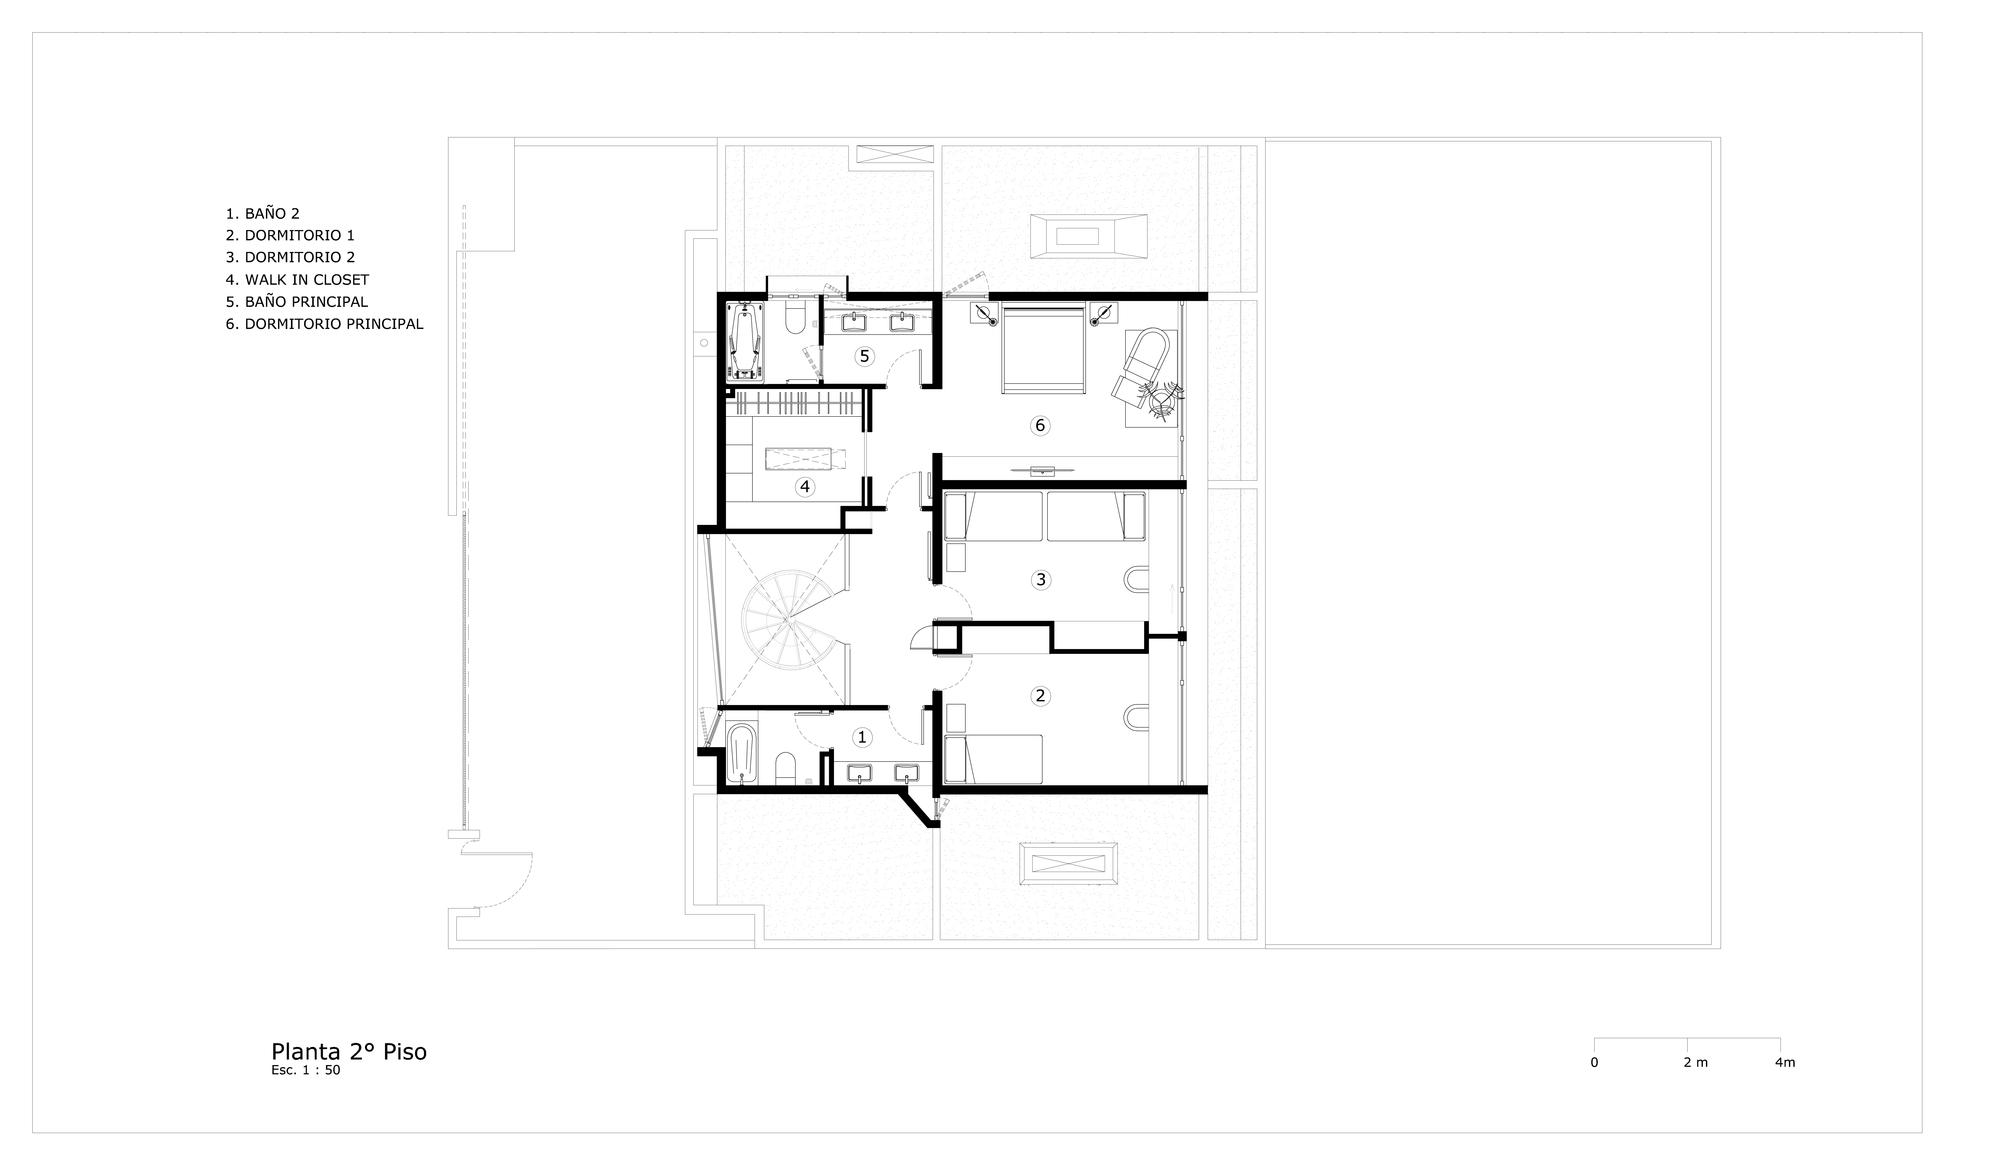 Galer a de casa m laga prietoschaffer arquitectos 13 - Arquitectos interioristas malaga ...